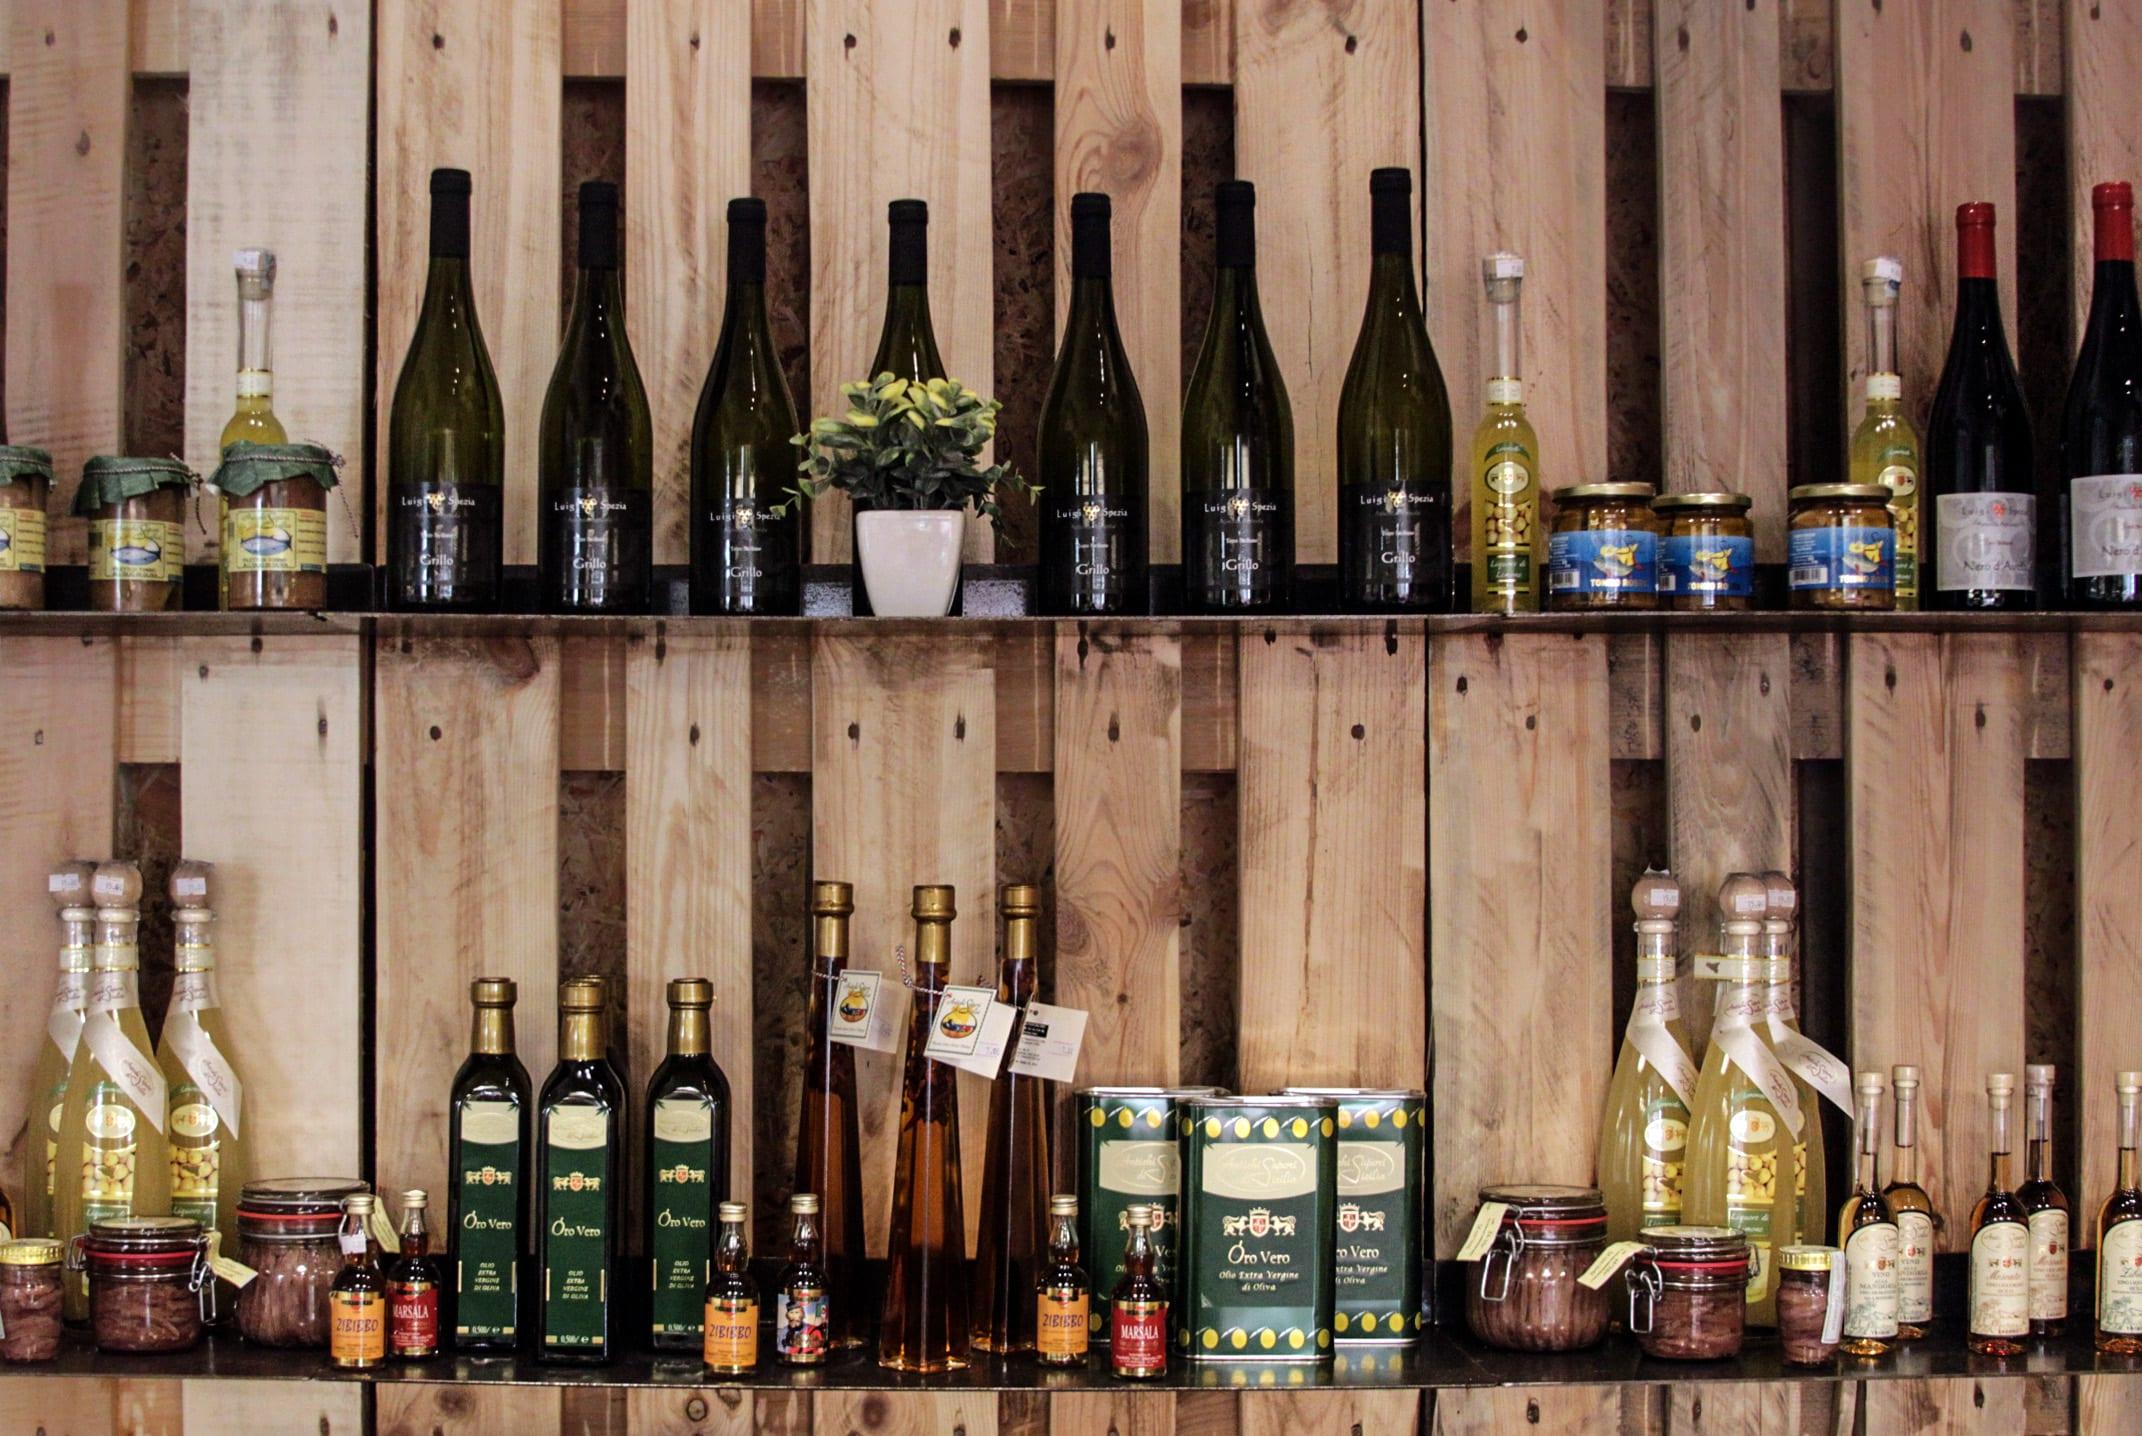 Bar Arredati Con Pallet saverio francesco tallarita · garibaldi 58 market · divisare